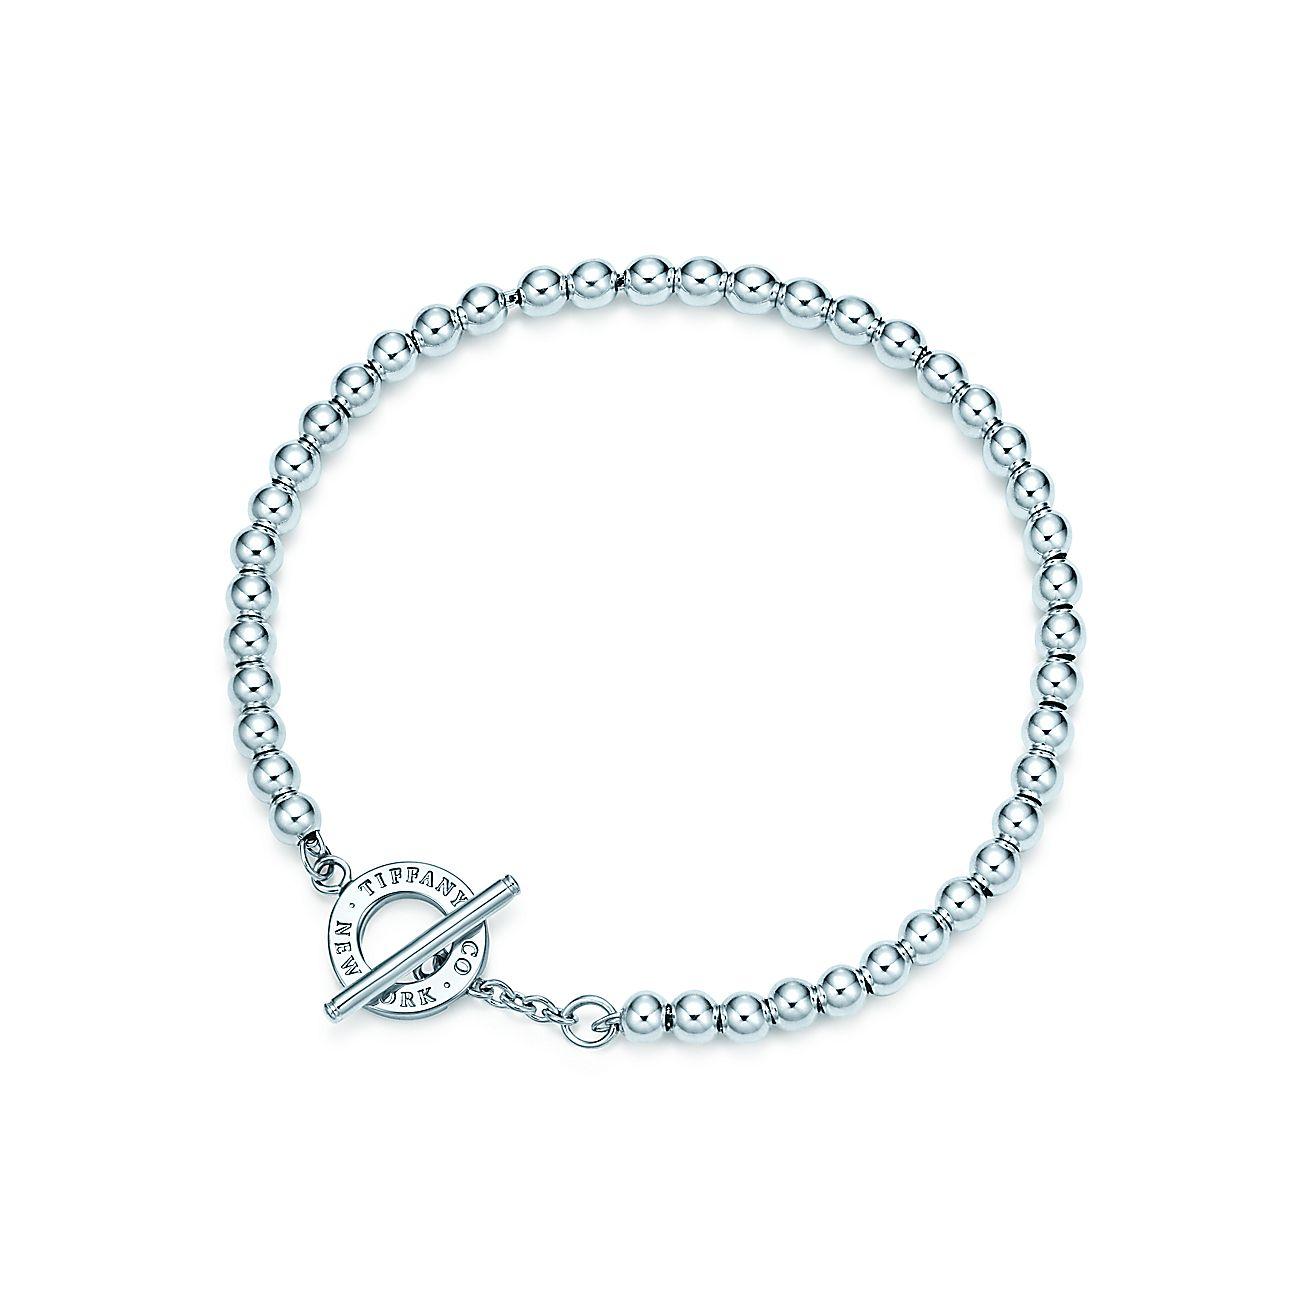 tiffany beads toggle bracelet in sterling silver medium. Black Bedroom Furniture Sets. Home Design Ideas